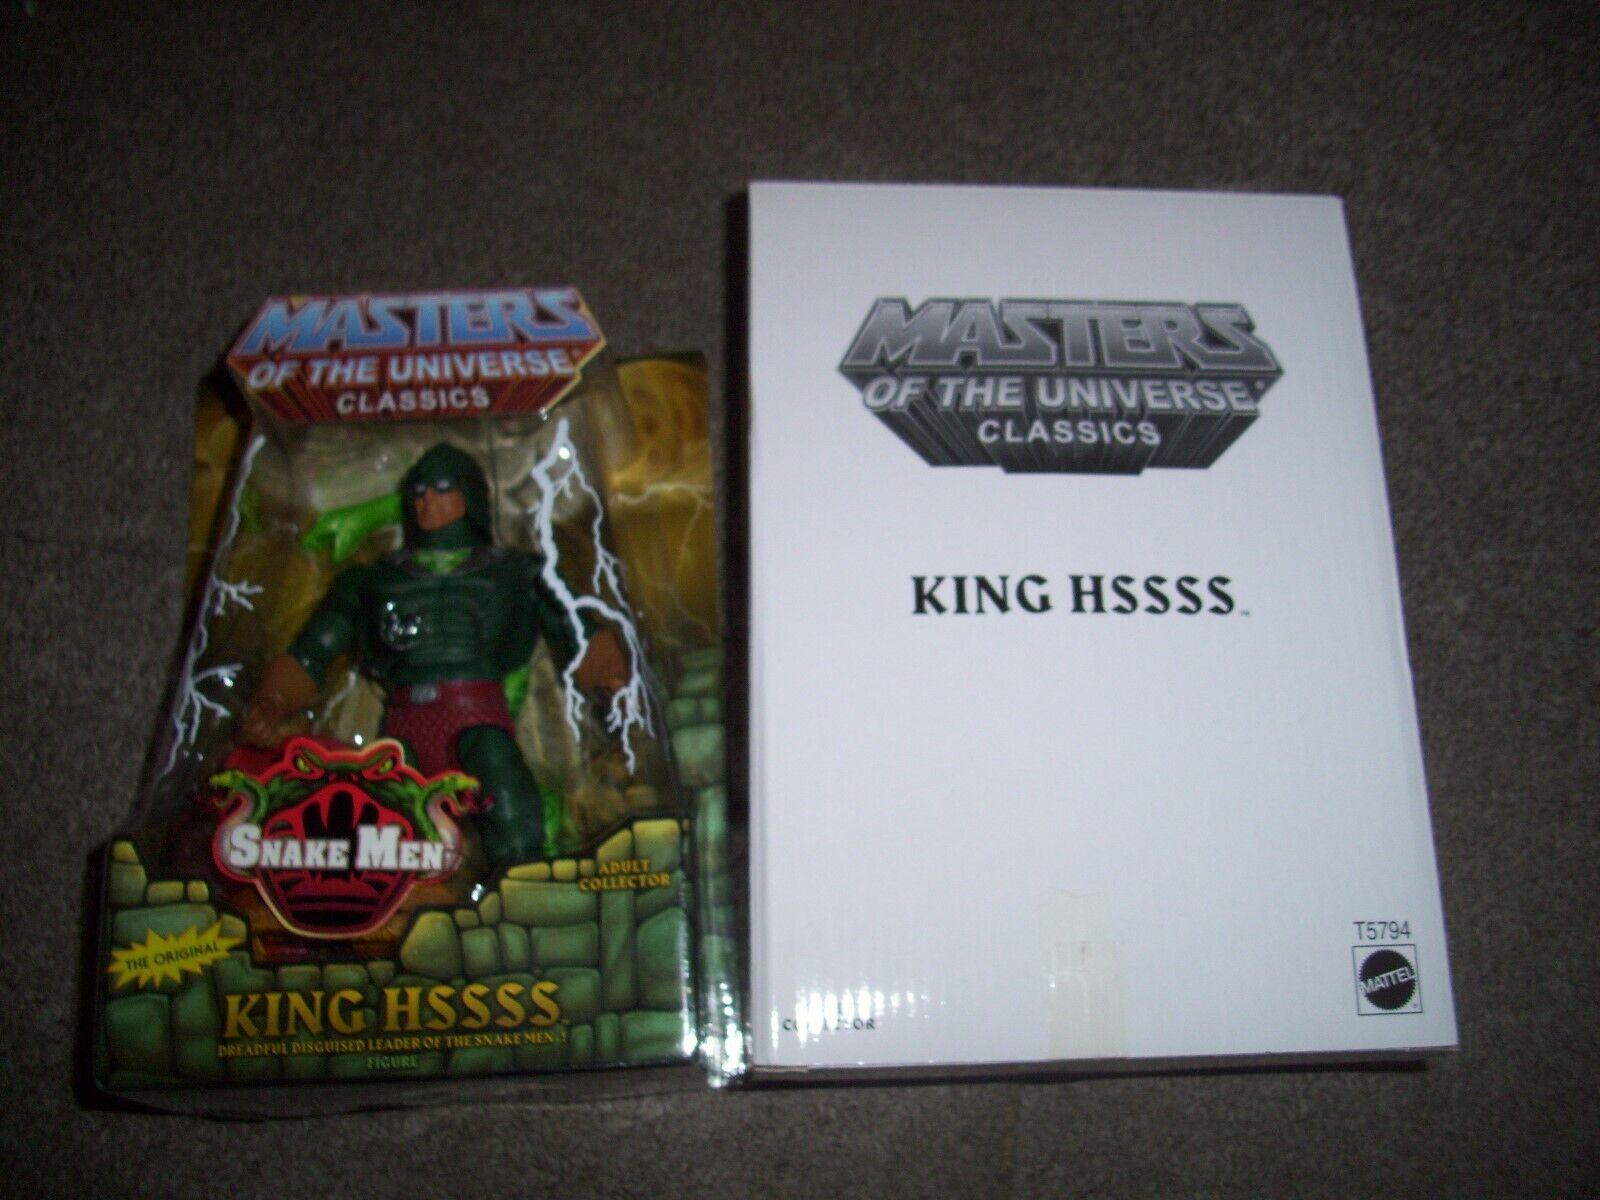 Masters Of The Universe Classics King Hssss figura